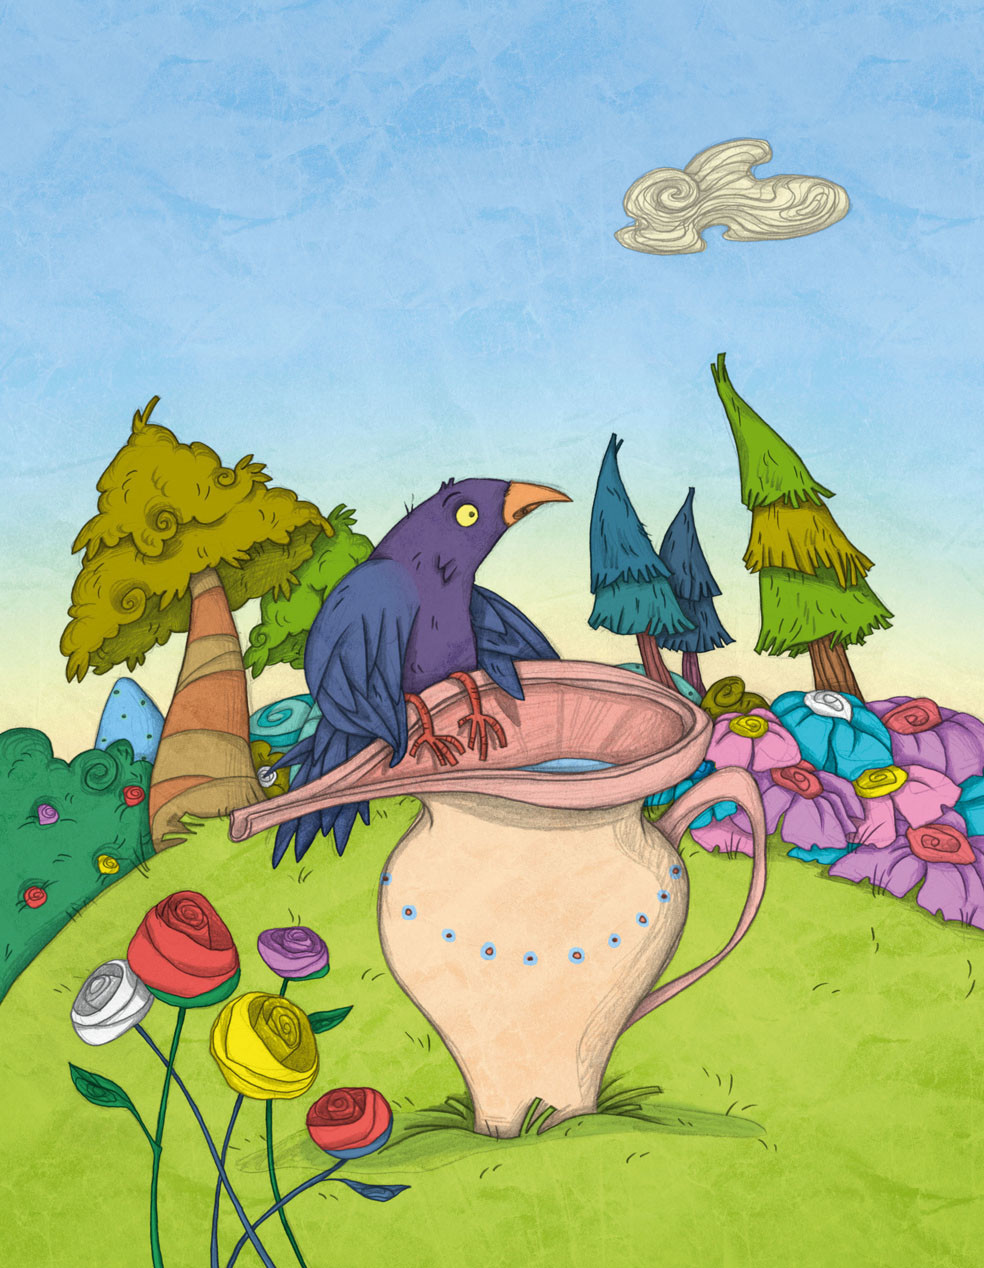 Autogiro illustration studio 8 crow text